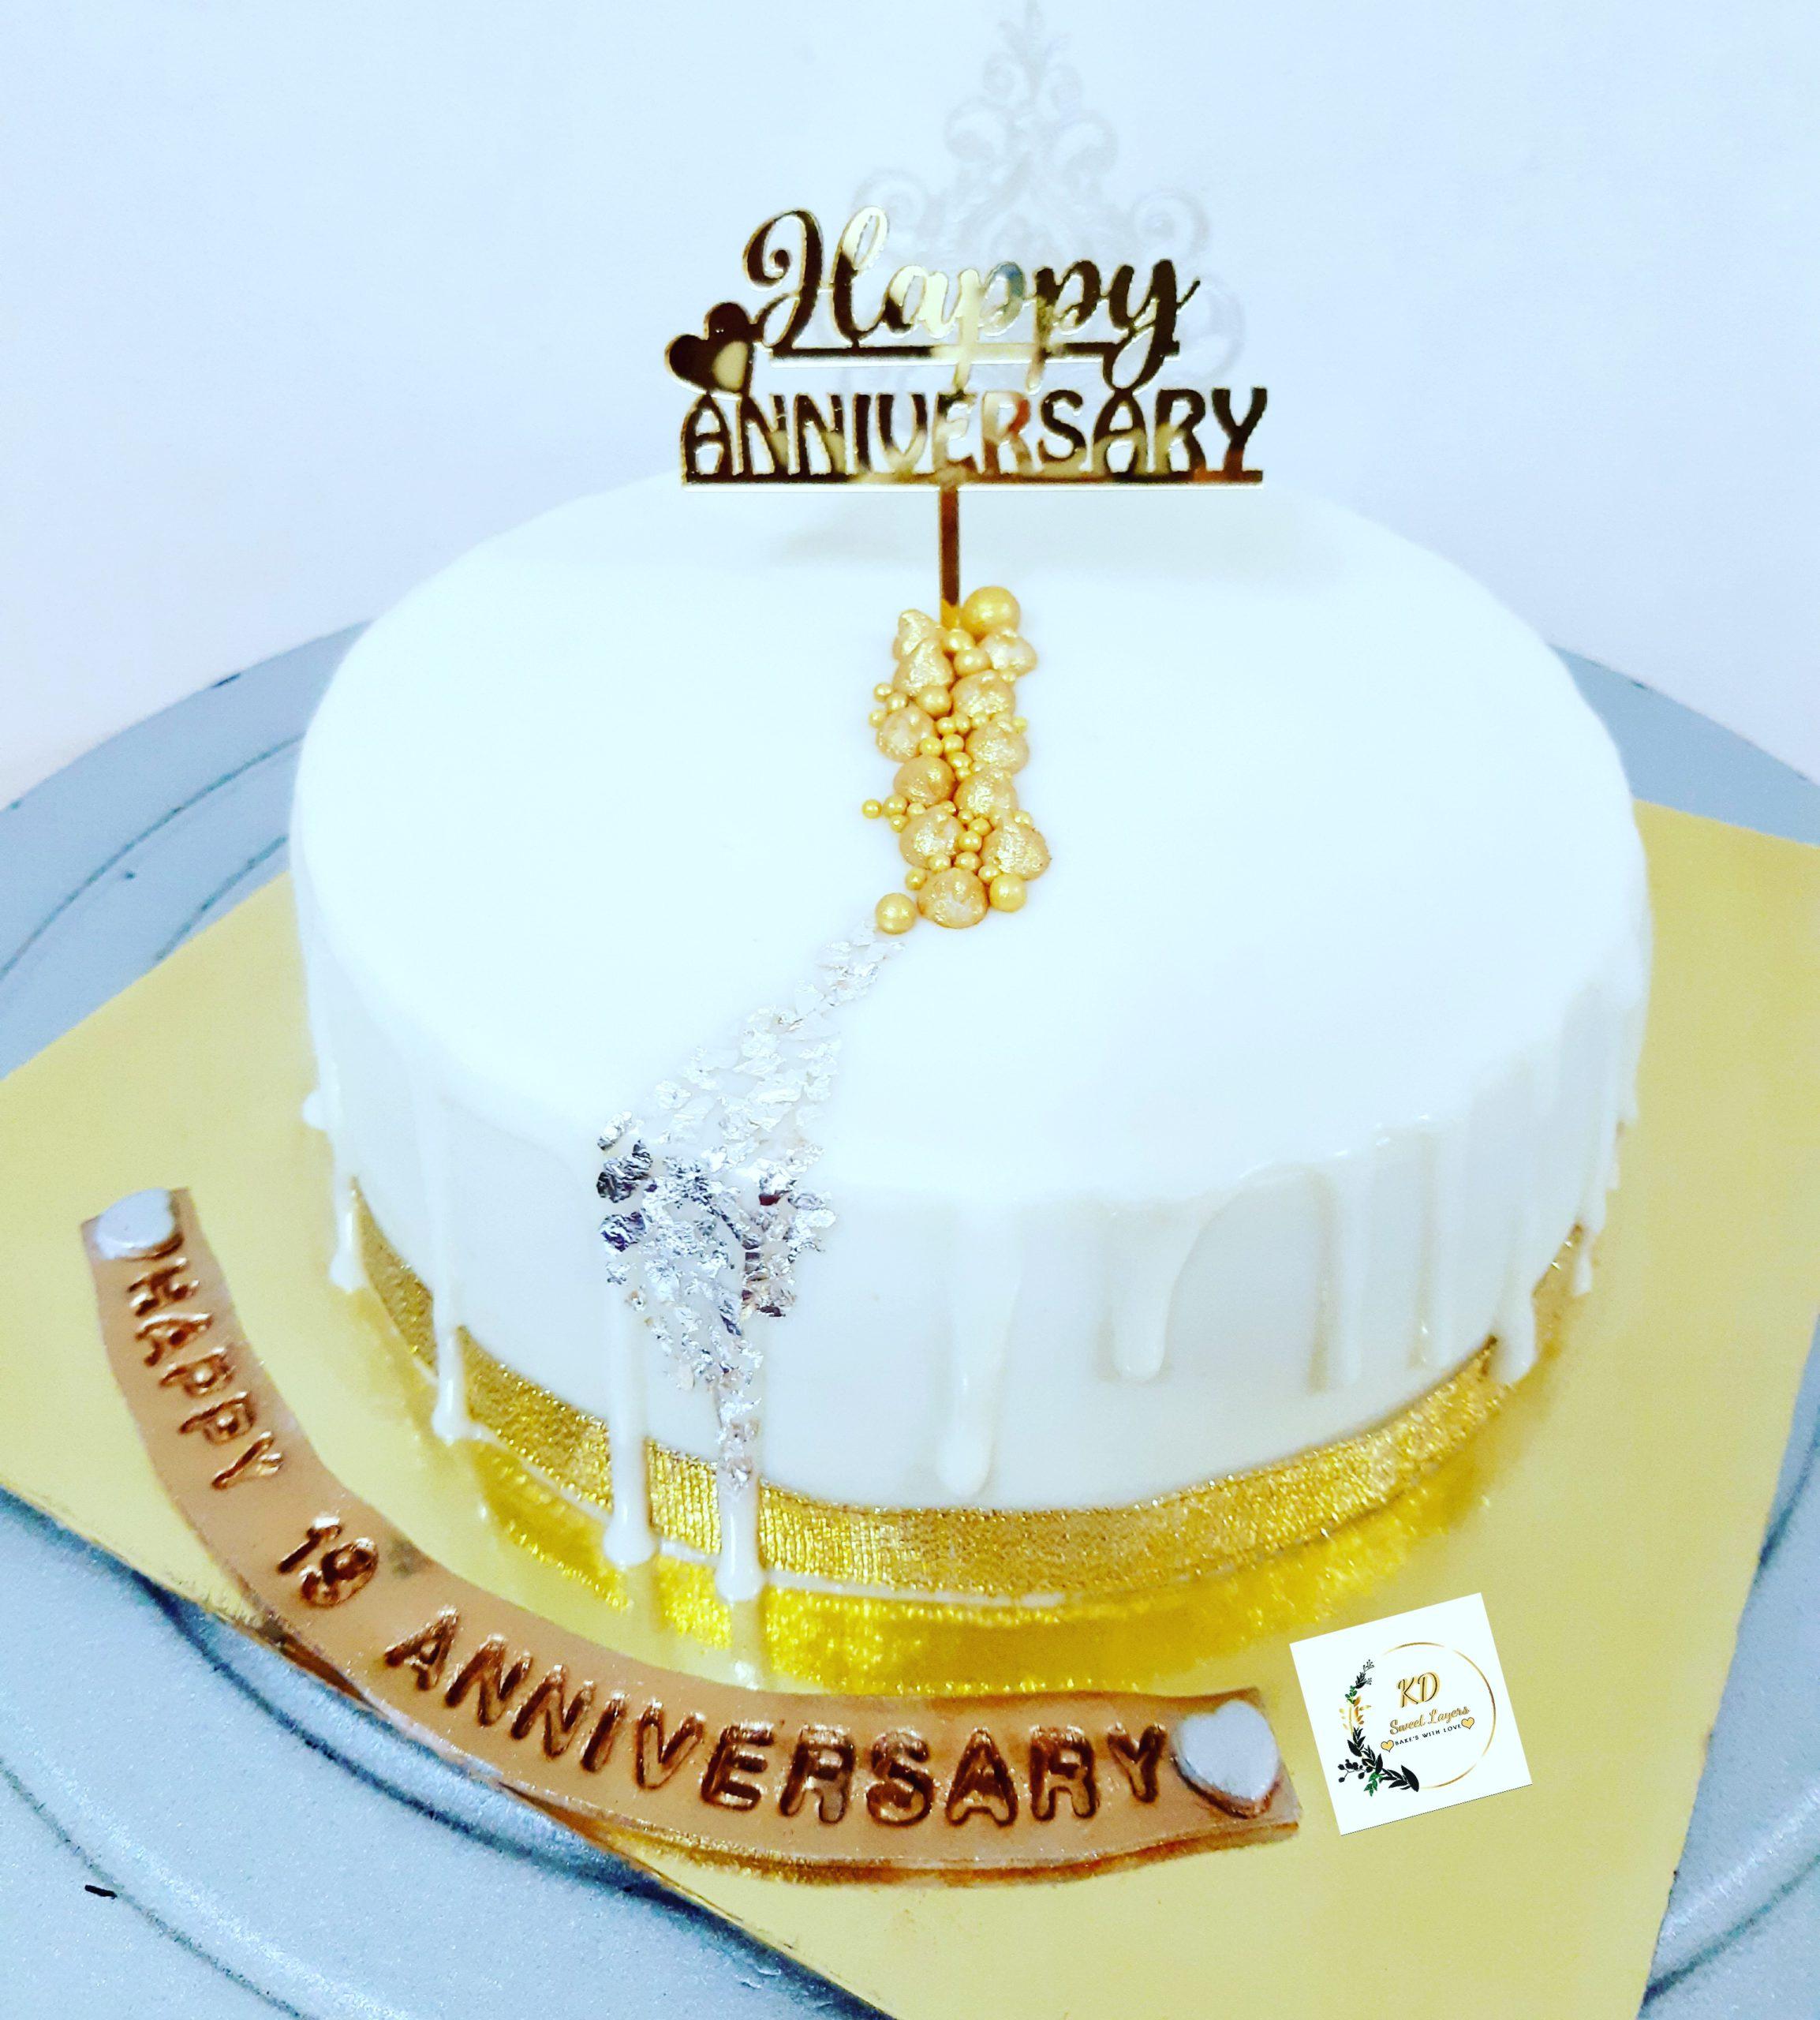 White Chocolate Cake Designs, Images, Price Near Me